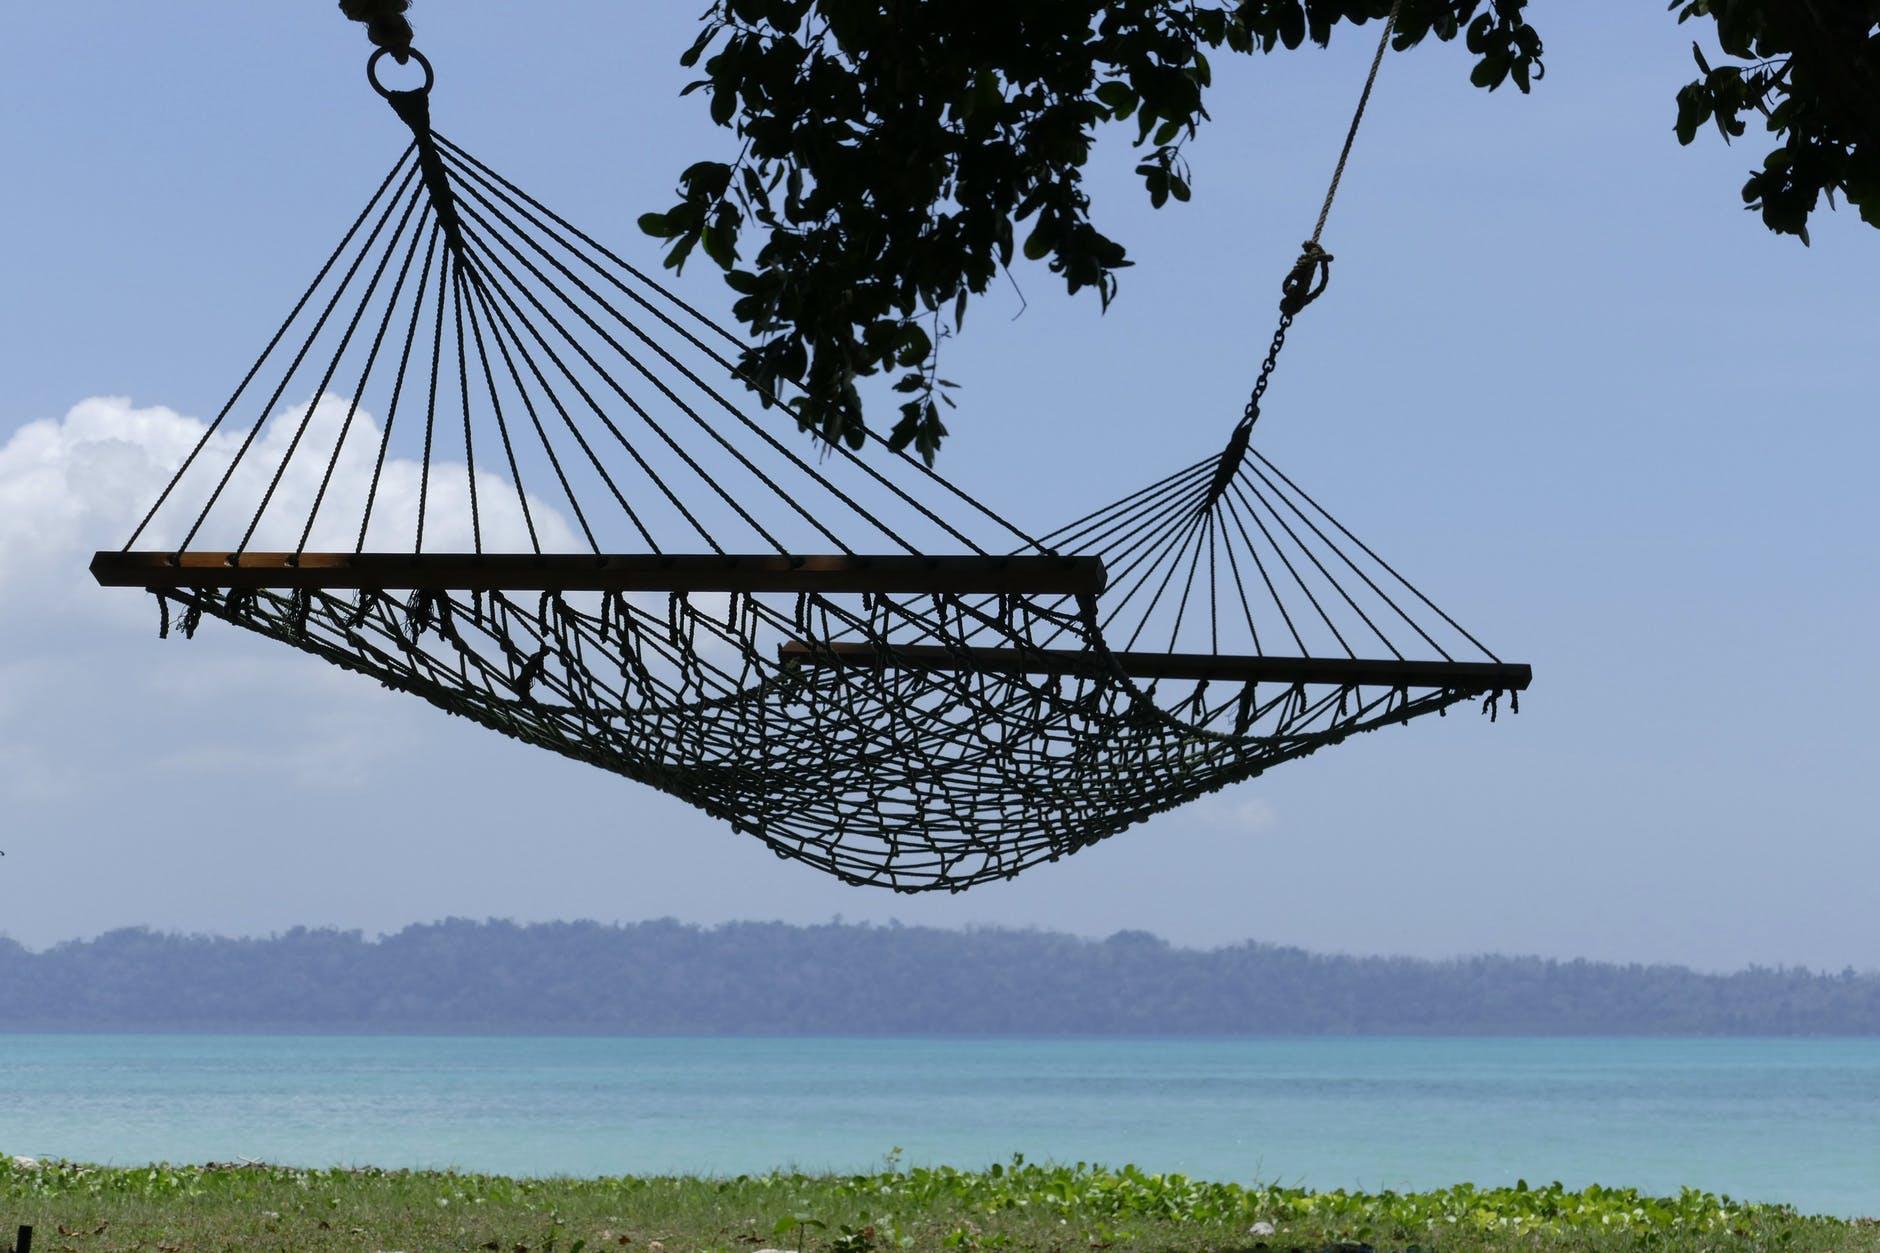 aquatic plants beach daylight hammock